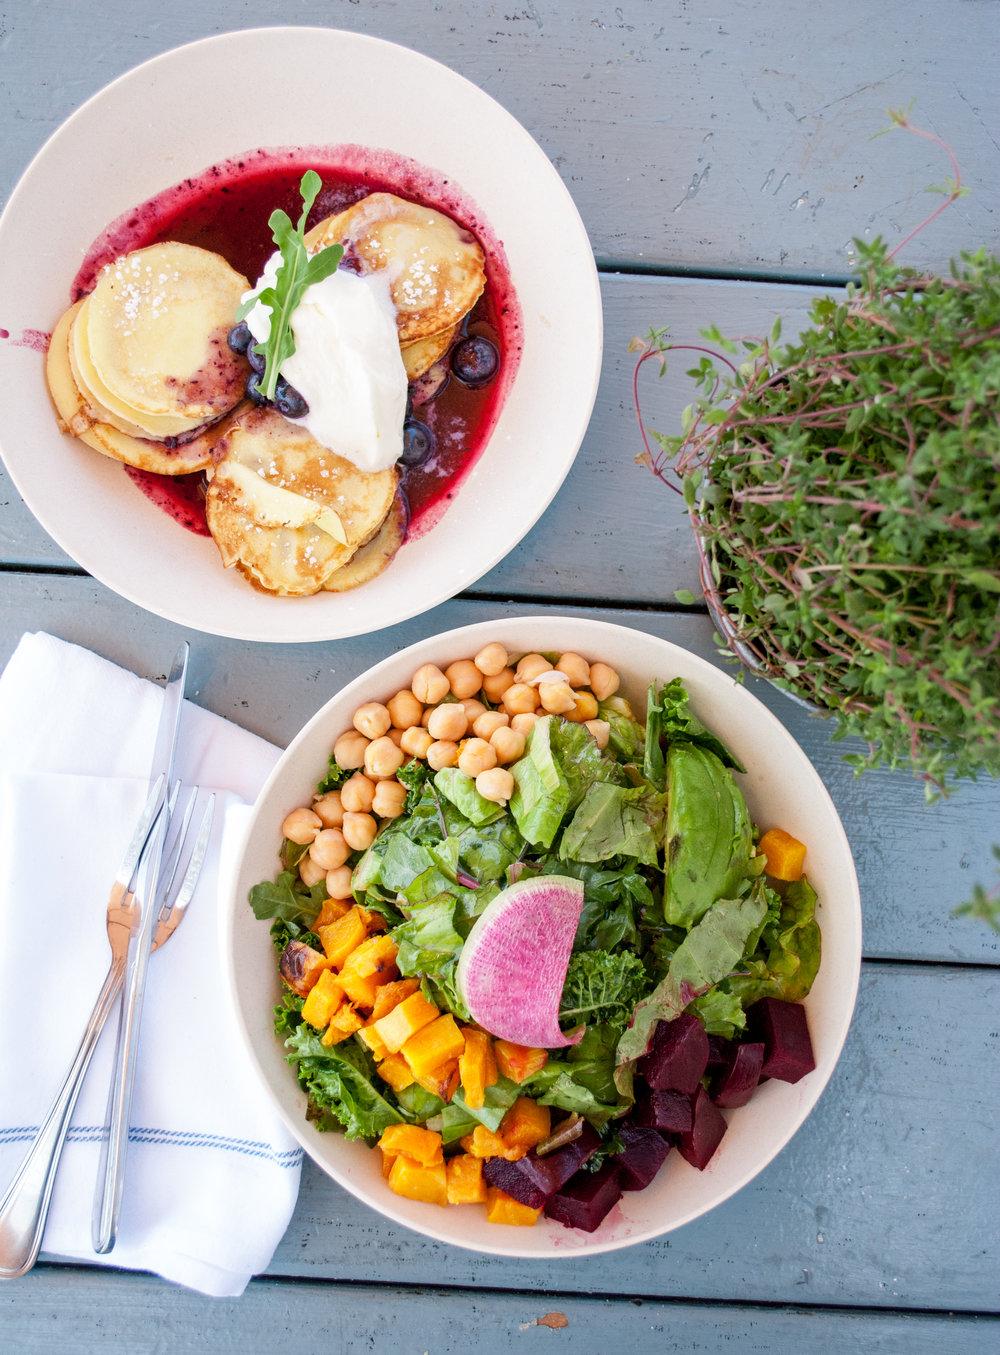 Swedish Mini Pancakes + Vegan Chop Salad, Malibu Farm Pier Café, Malibu